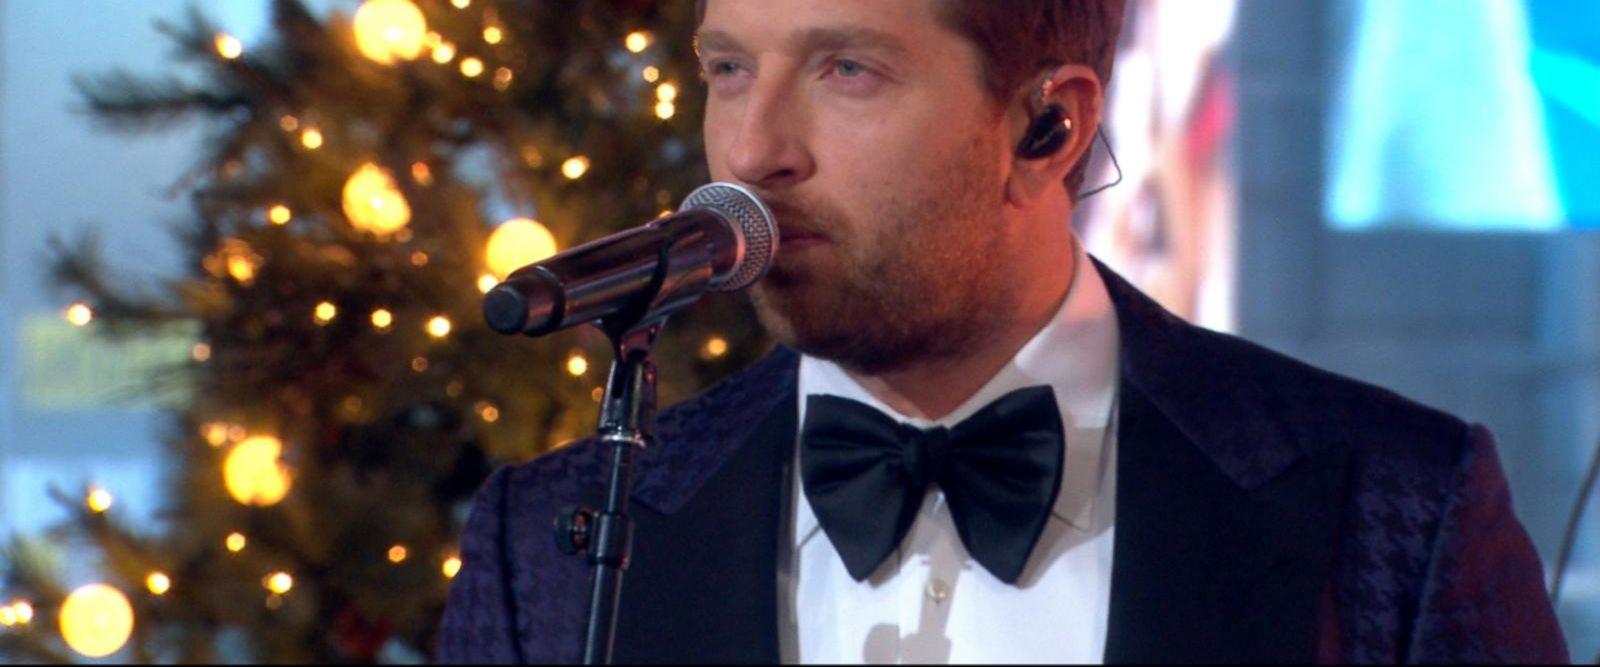 VIDEO: Brett Eldredge performs 'Glow' off his new Christmas album